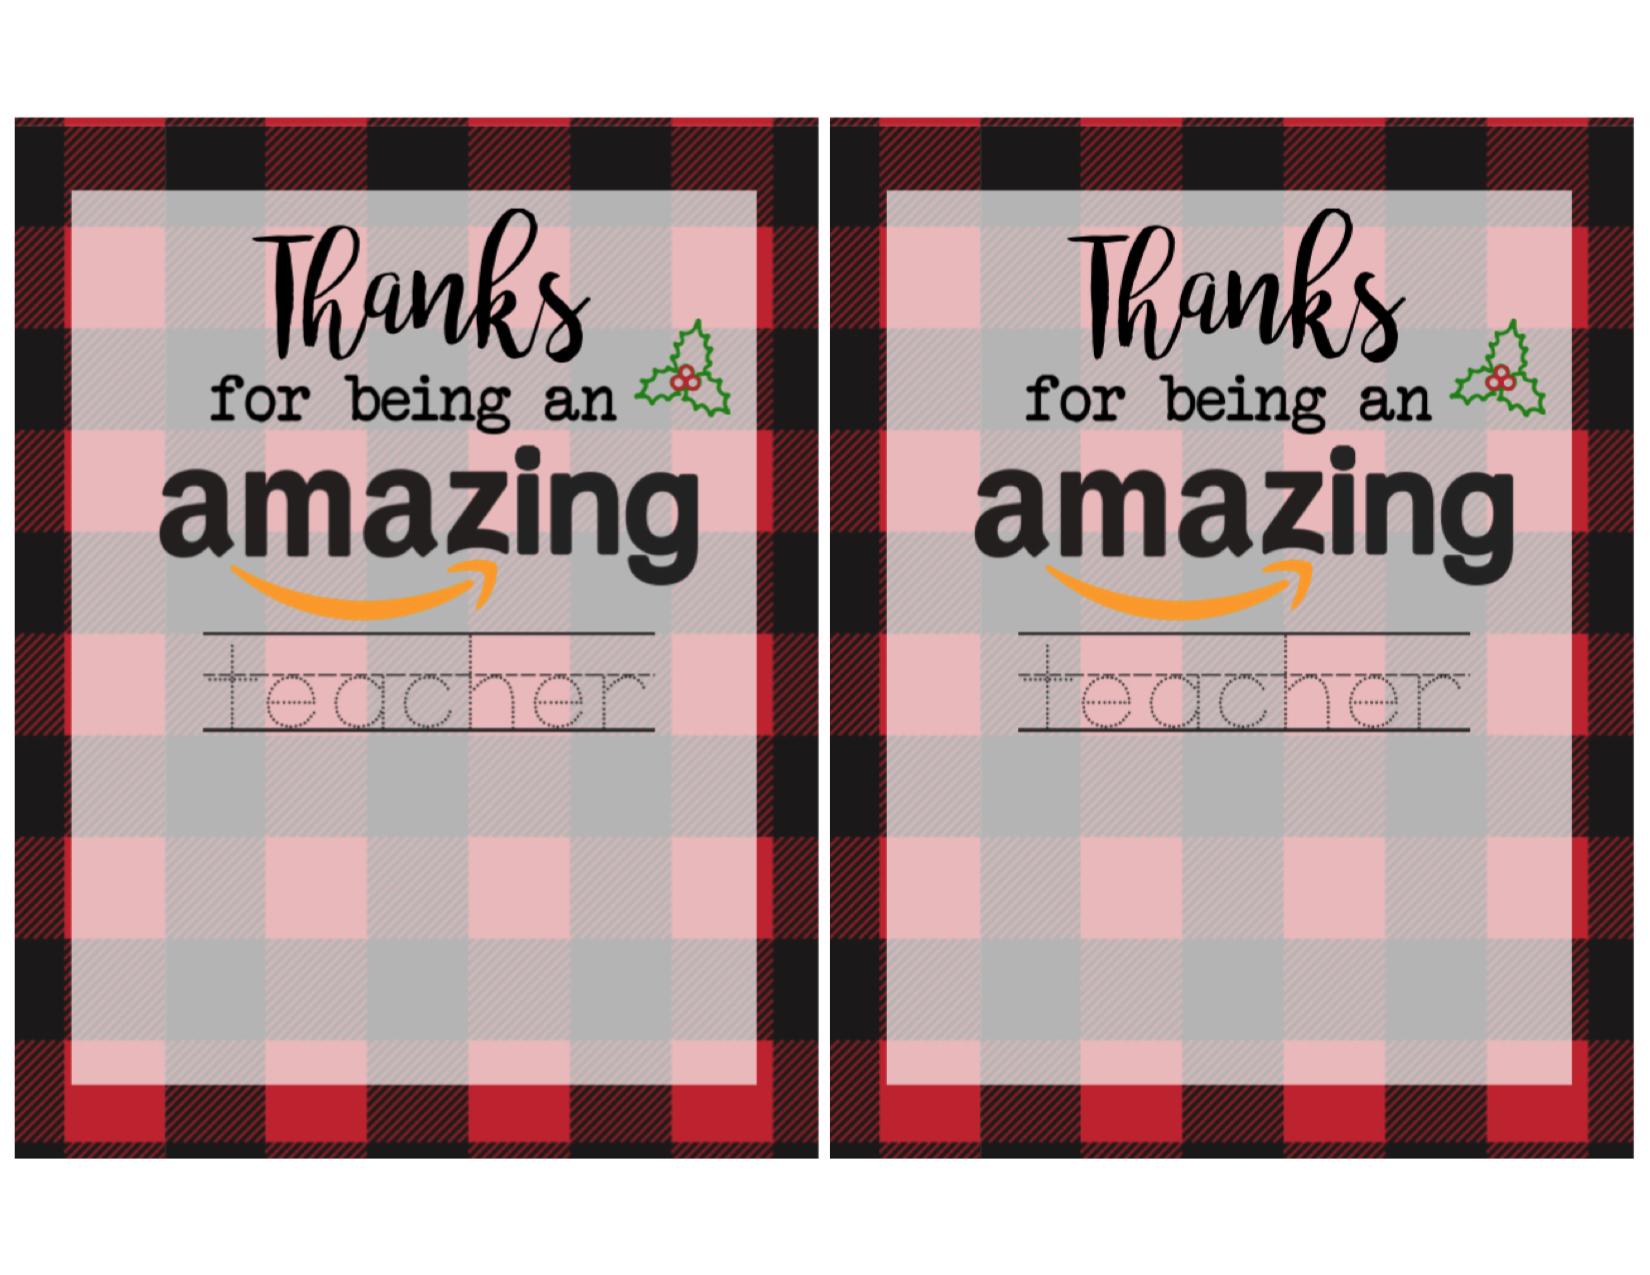 printable christmas gift card holders for amazon paper trail design have an amazing christmas printable